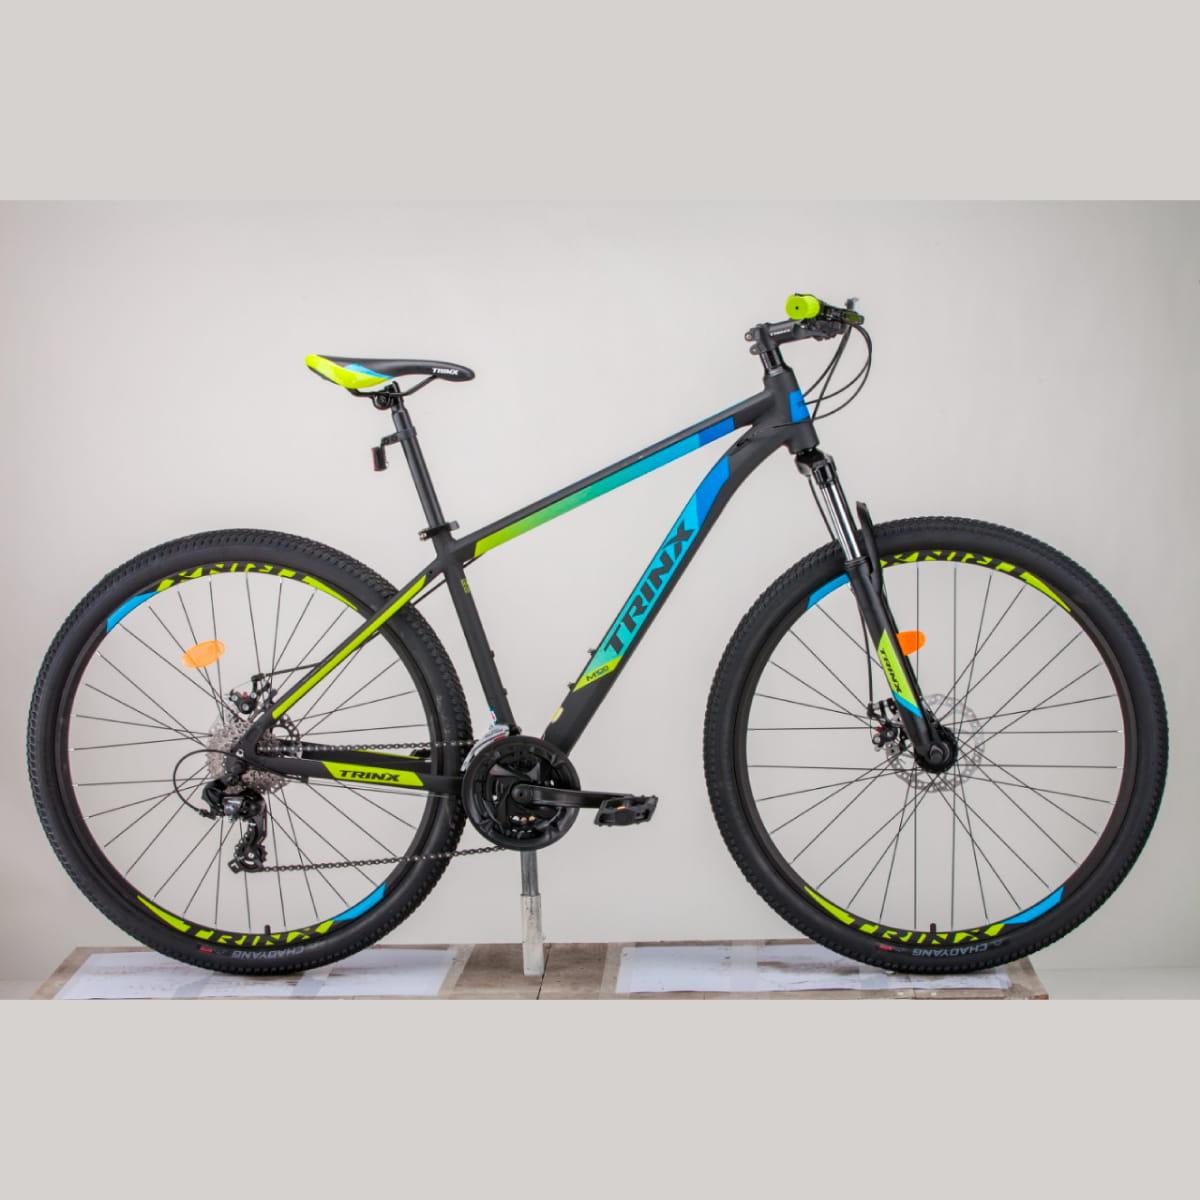 Bike Trinx M100 Max 2020 24v Shimano Azul Amarelo